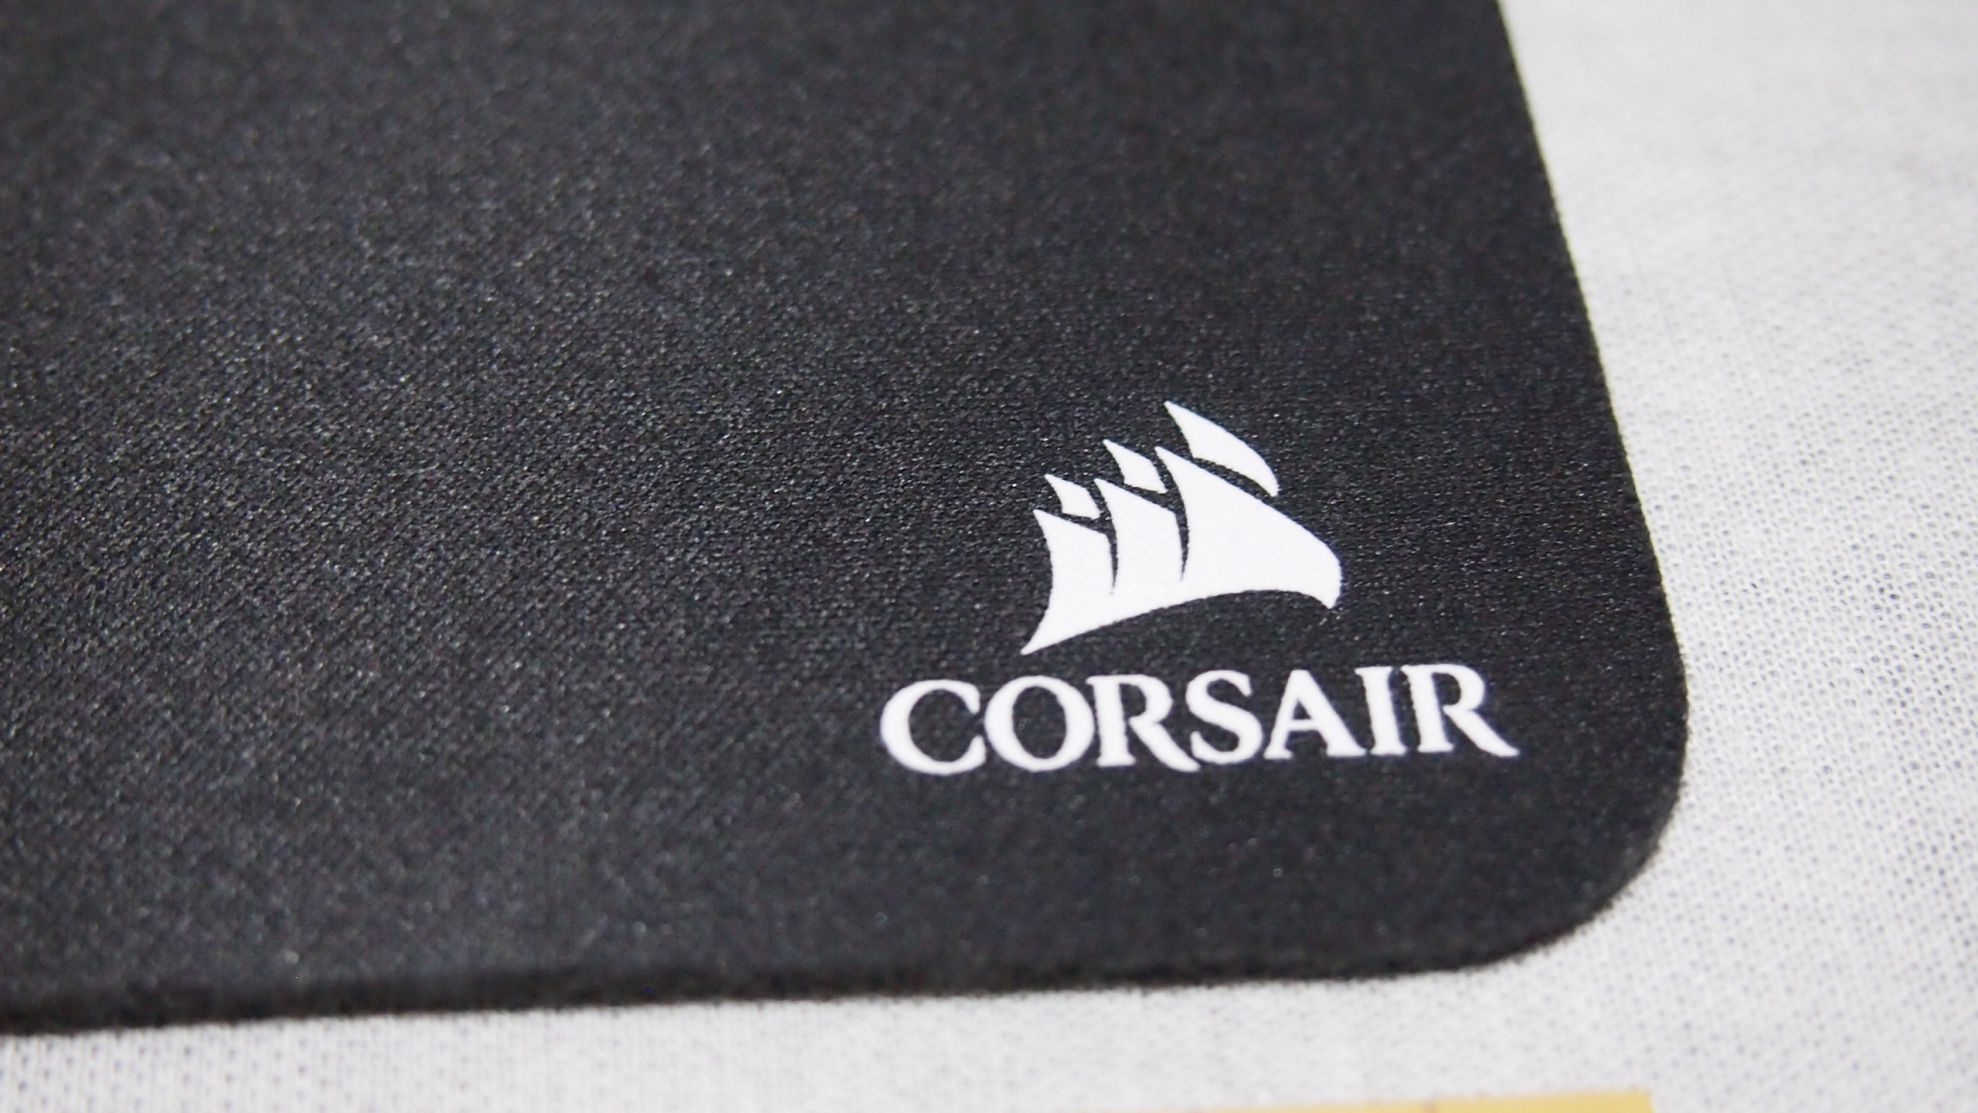 Corsair製のMM100の生地 表面